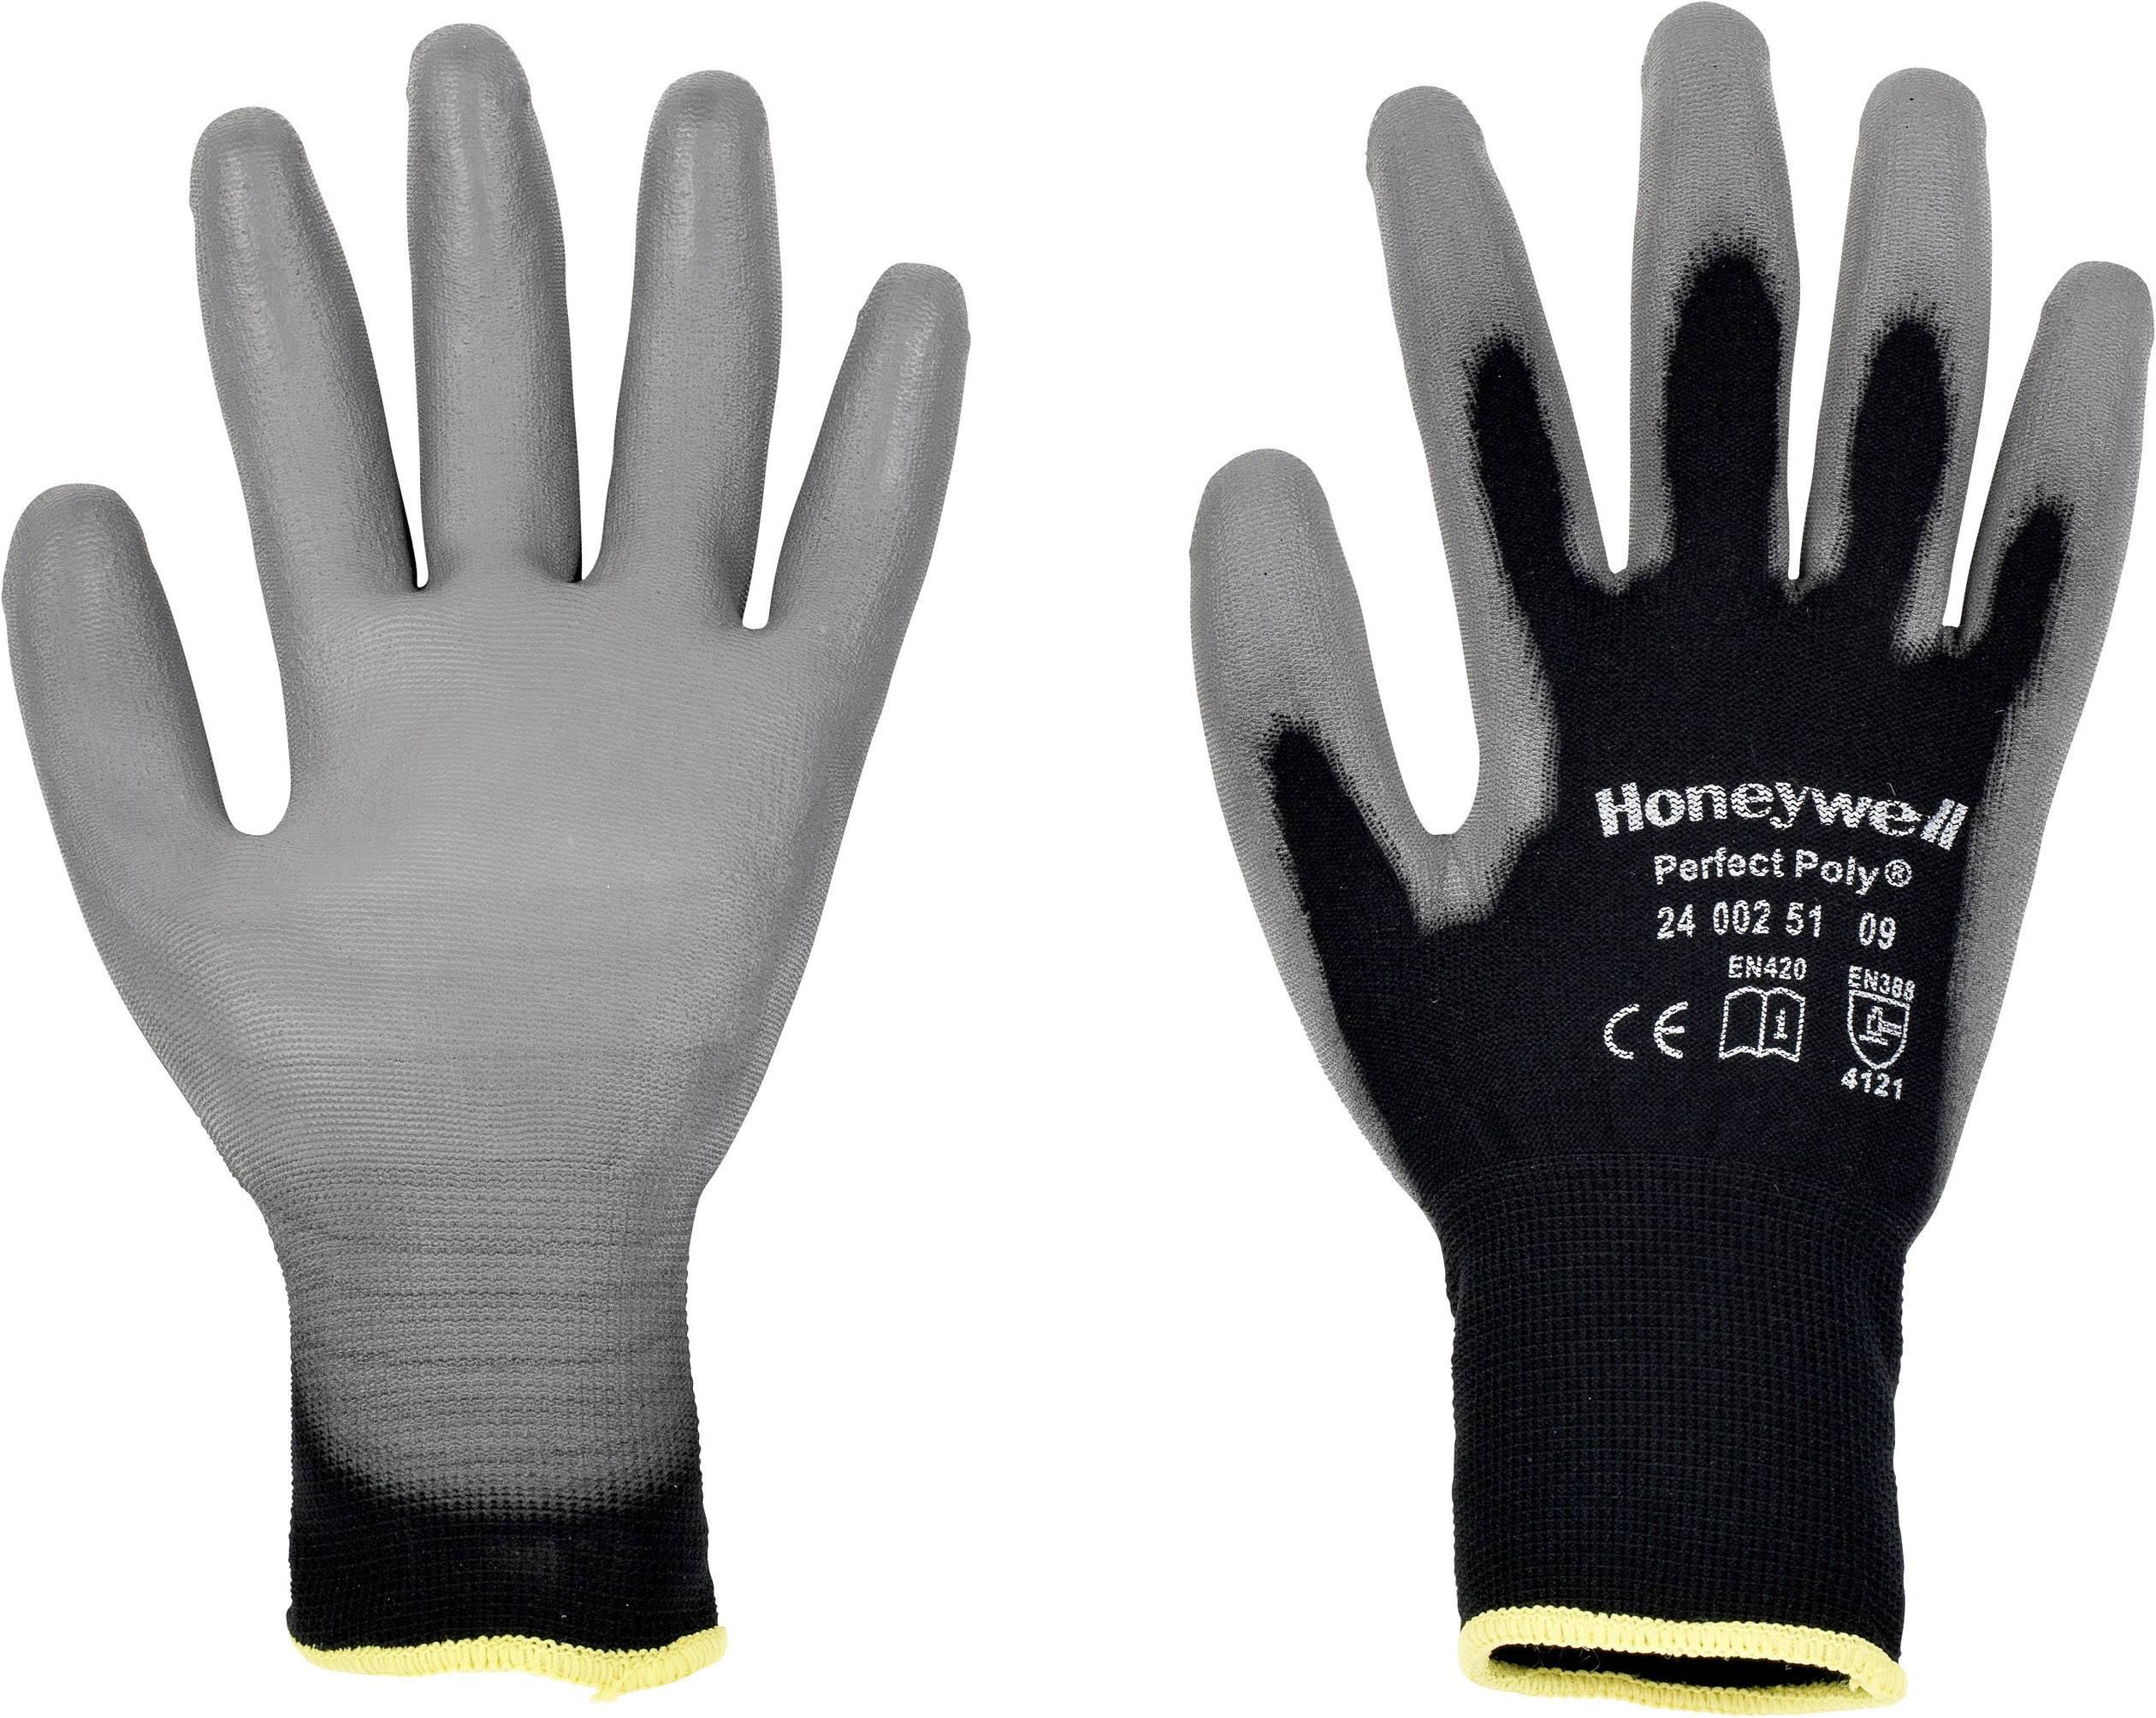 Pracovné rukavice Perfect Fit GANTS NOIRS PERFECTPOLY . 2400251, velikost rukavic: 7, S